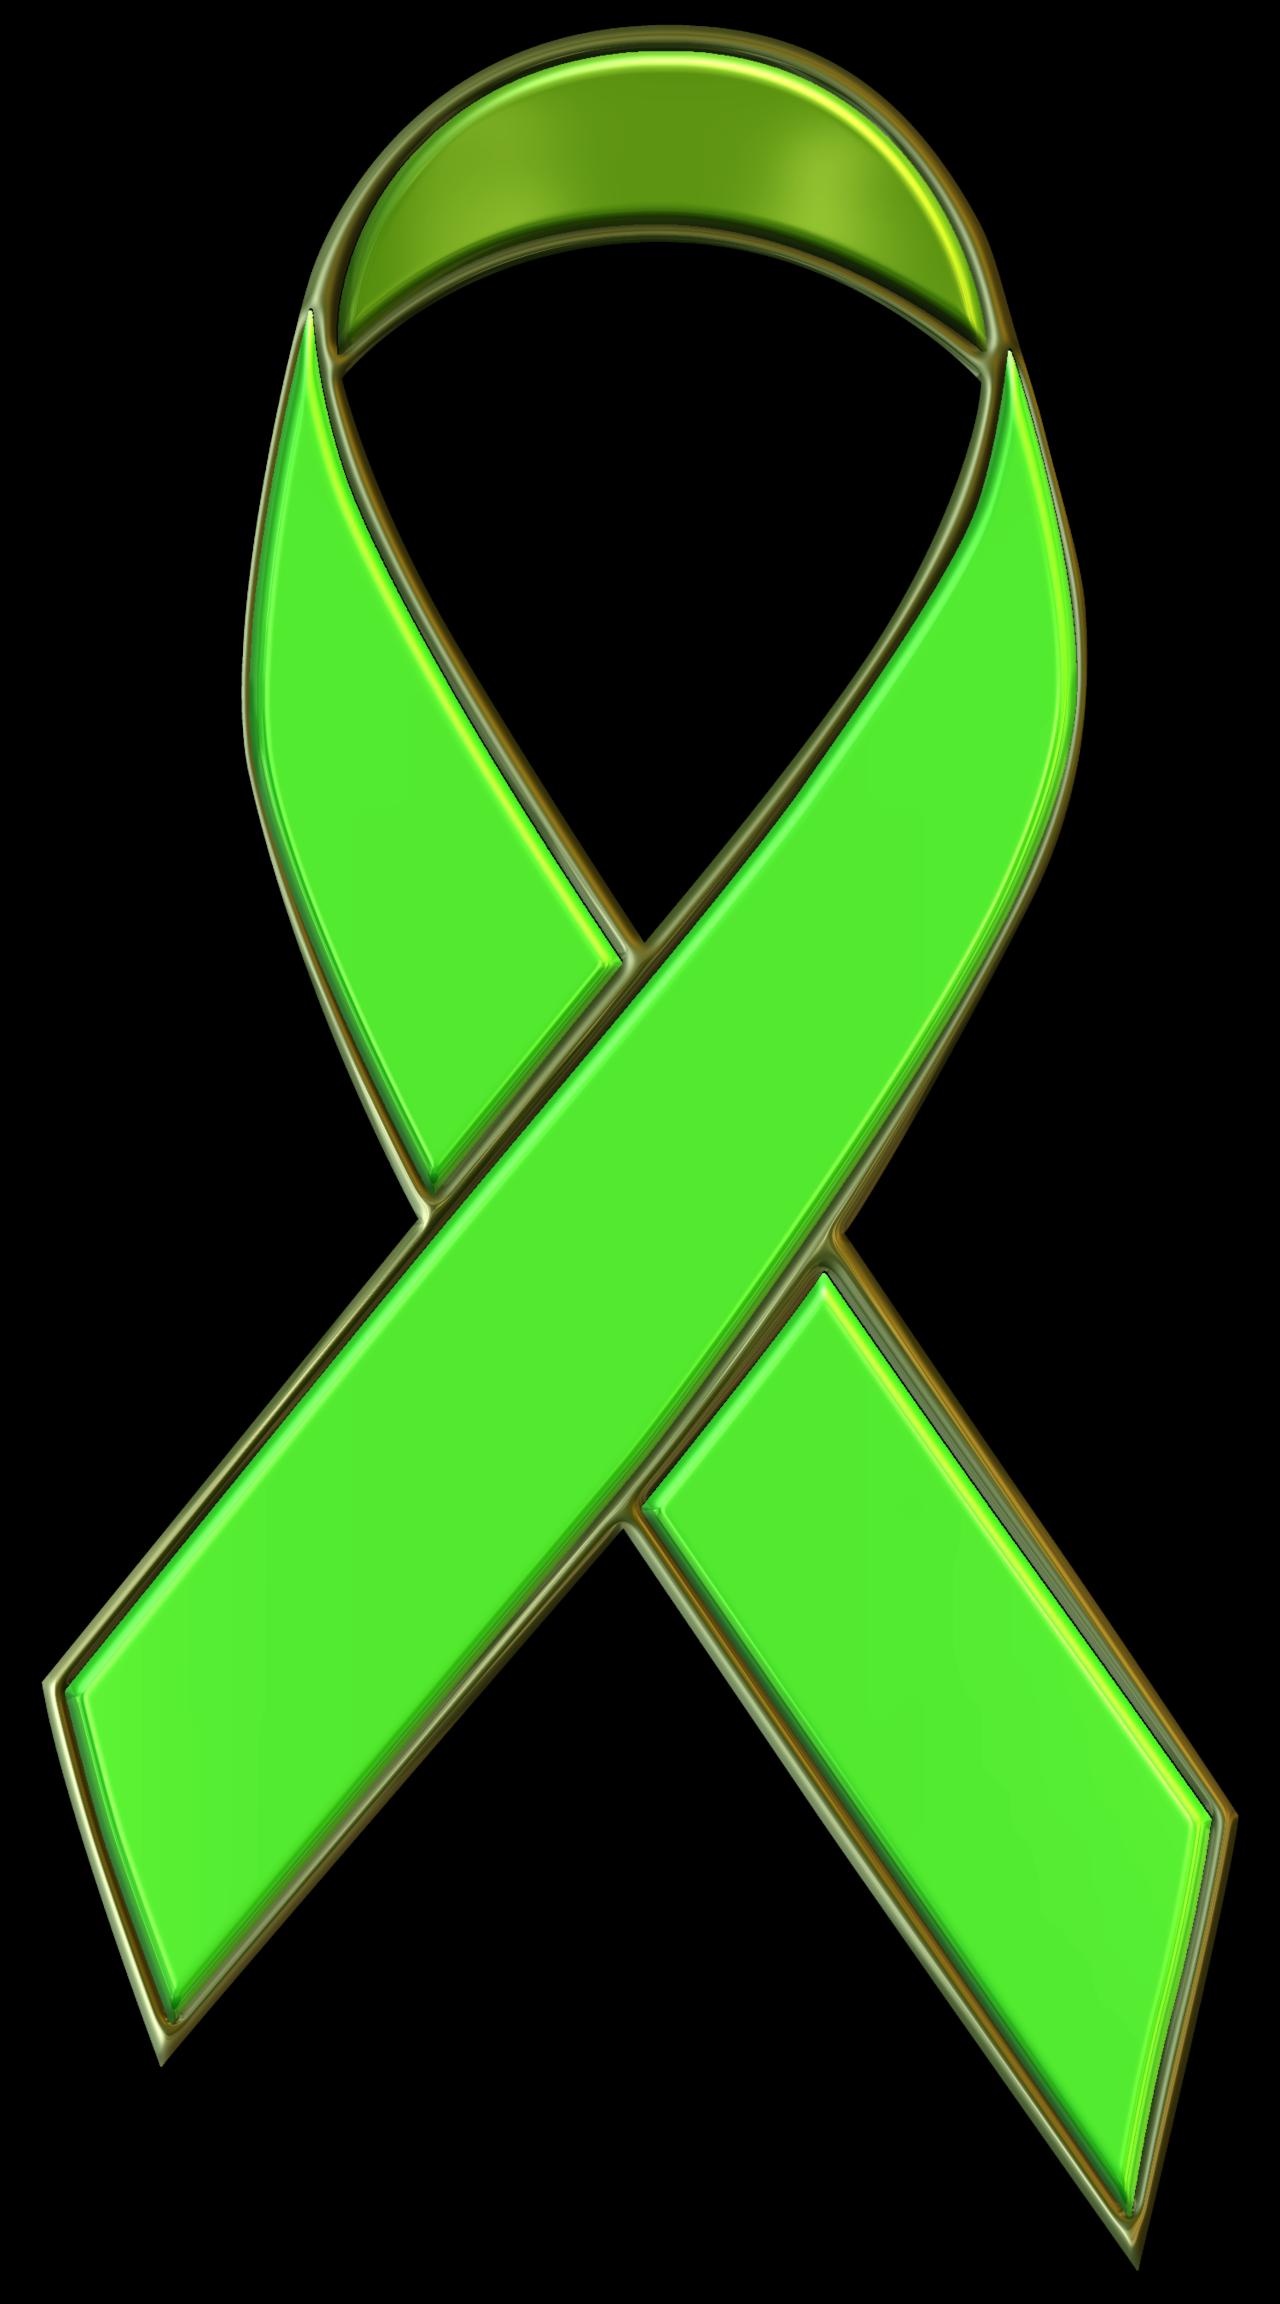 free clip art green ribbon - photo #23